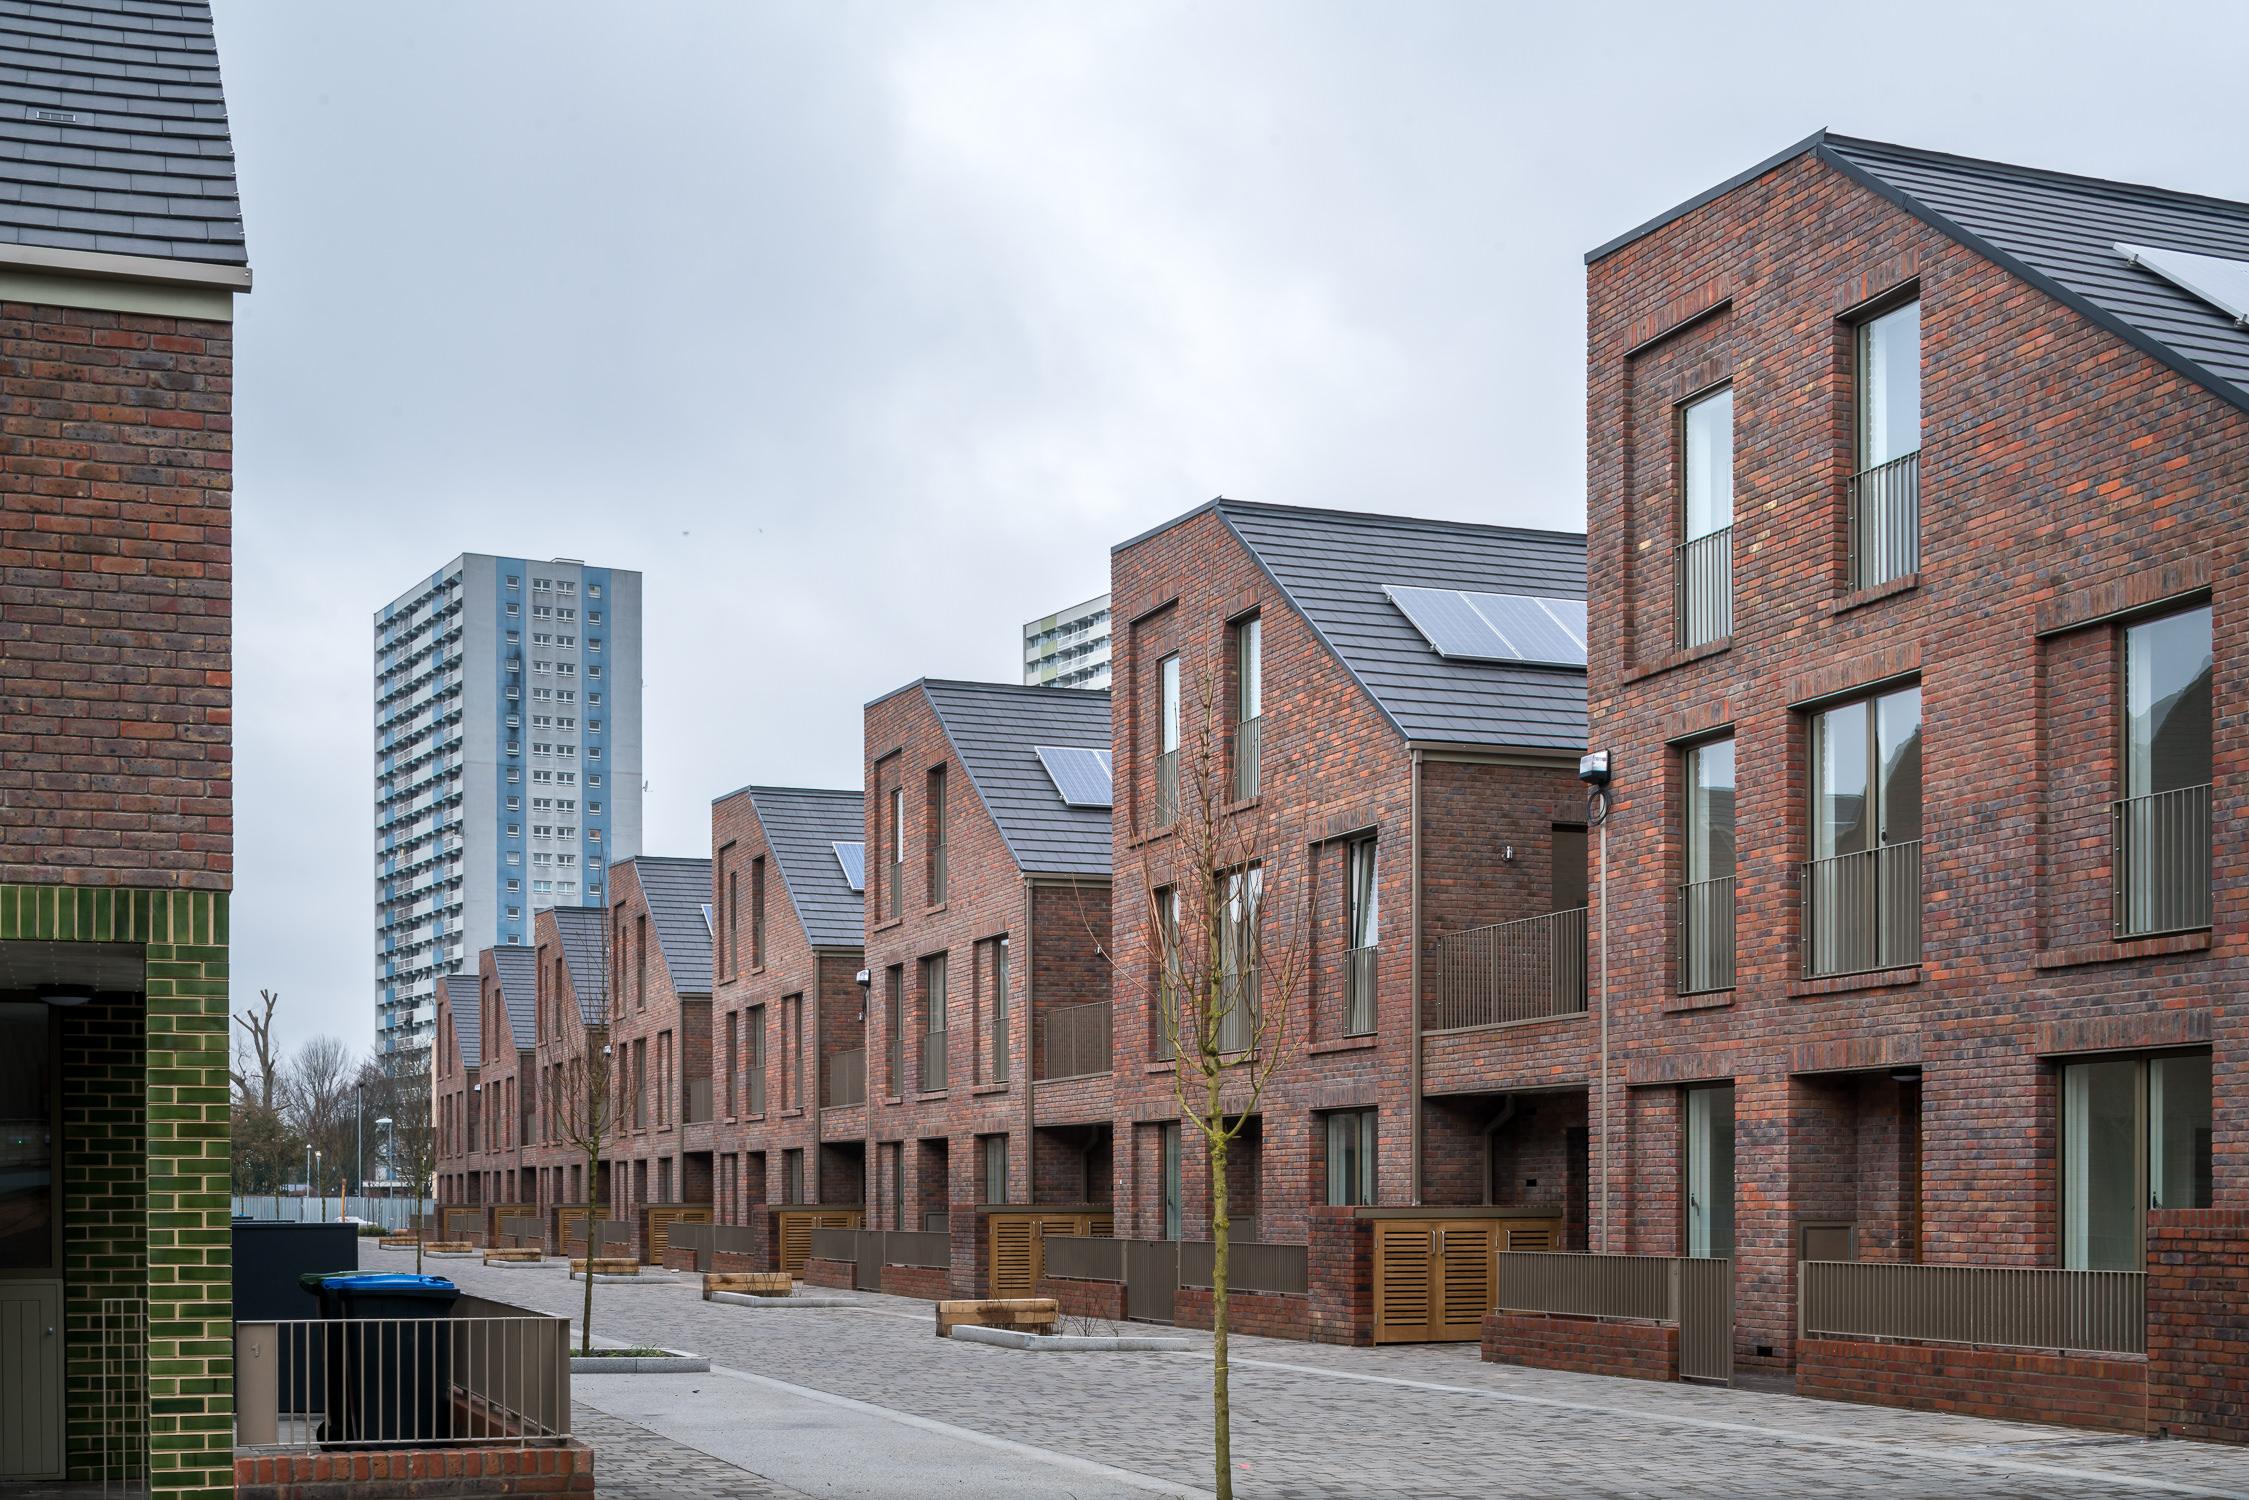 mark-hadden-architecture-photographer-architectuur-interieur-fotografie-london-amsterdam-Dujardin Mews-027.jpg